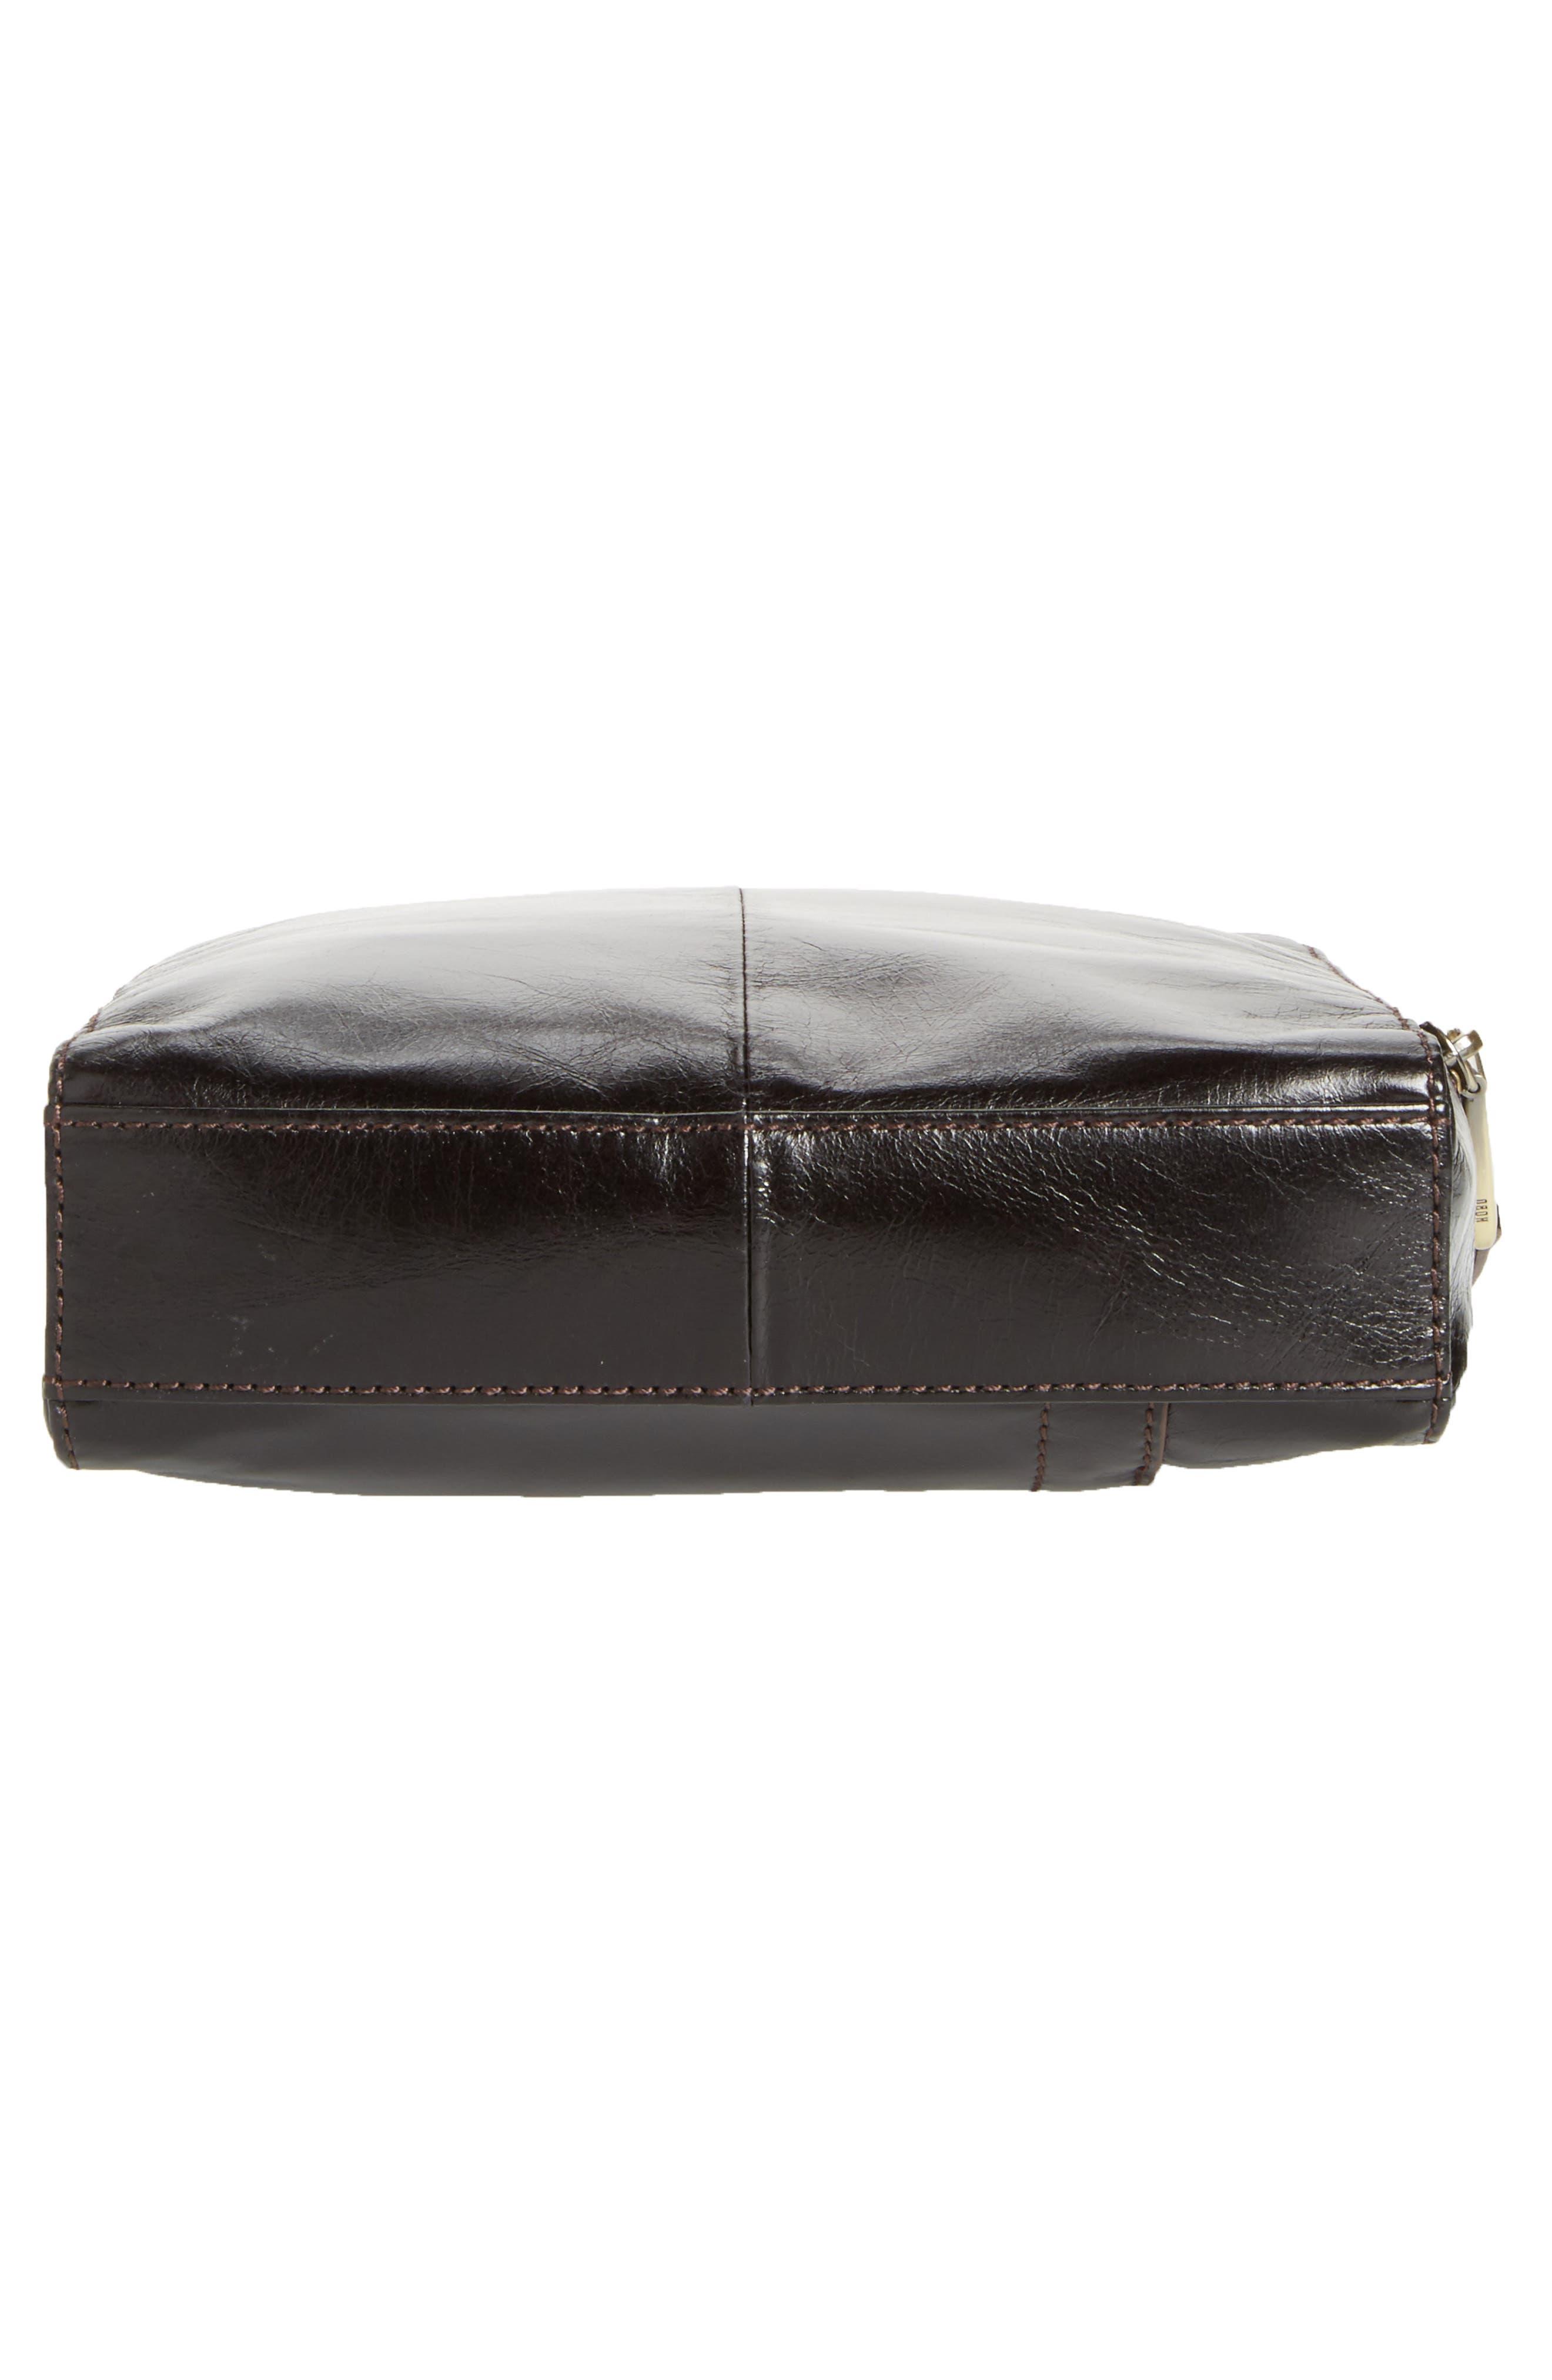 Lyric Leather Crossbody Bag,                             Alternate thumbnail 6, color,                             001